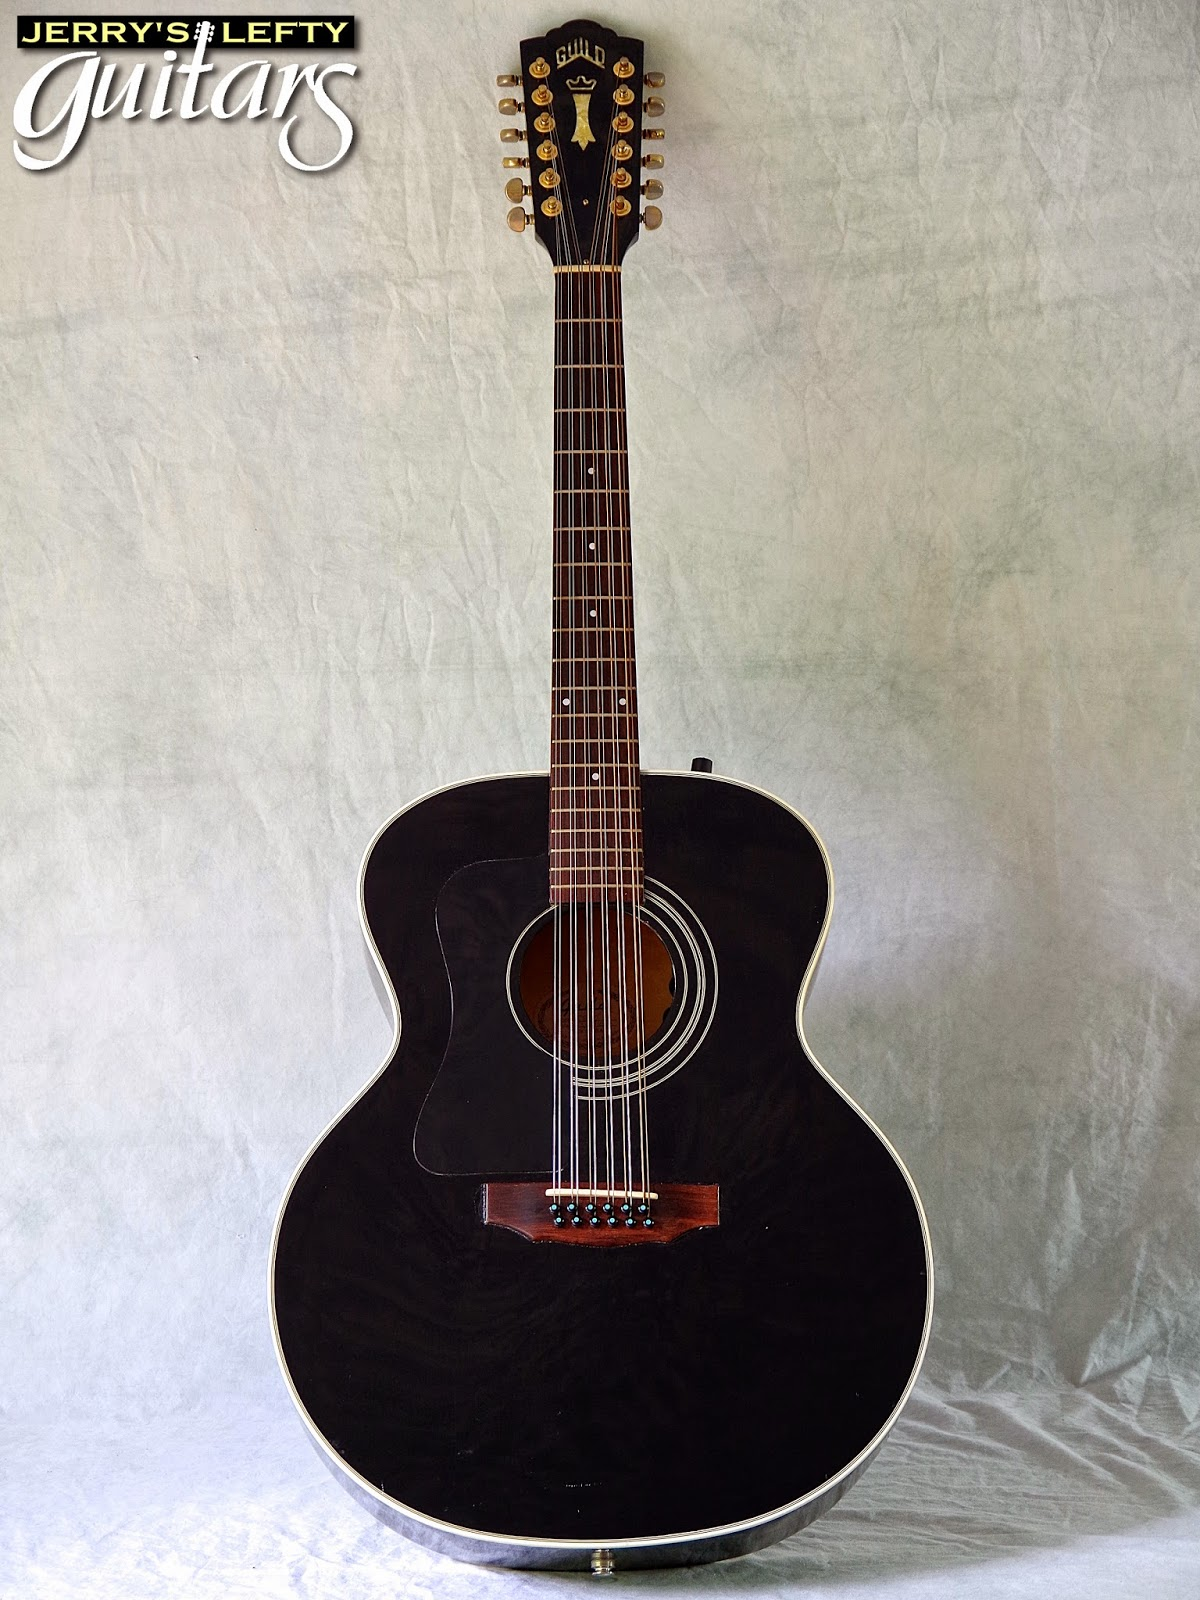 jerry 39 s lefty guitars newest guitar arrivals updated weekly 1997 guild jf30 black 12 string. Black Bedroom Furniture Sets. Home Design Ideas